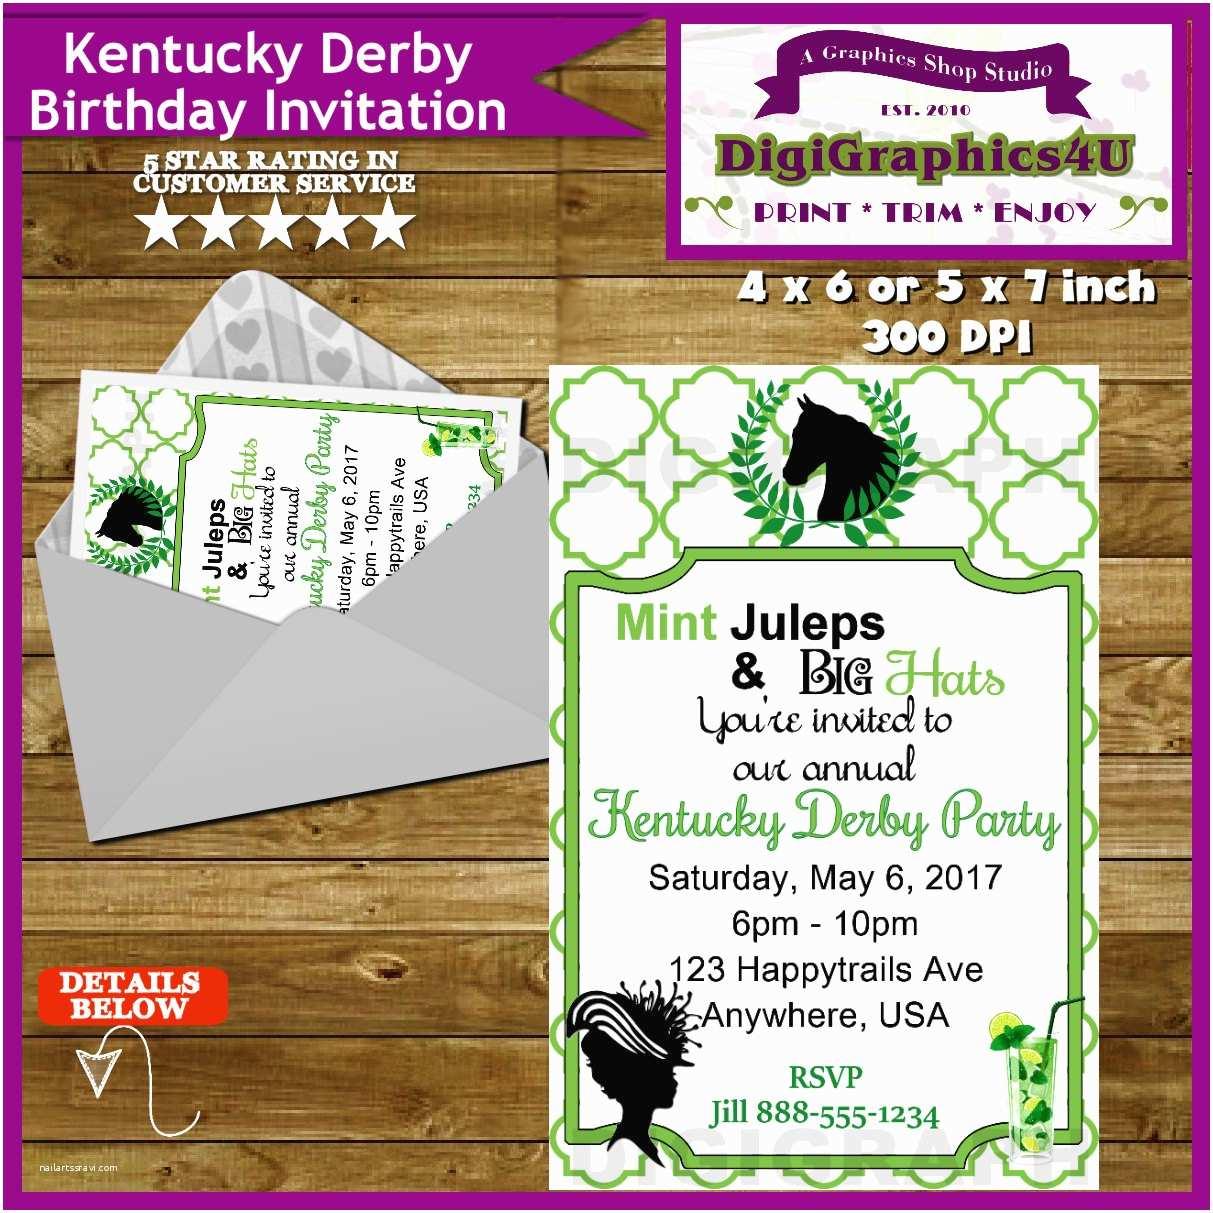 Kentucky Derby Party Invitations Kentucky Derby Party Invitation Derby Party Horse Racing